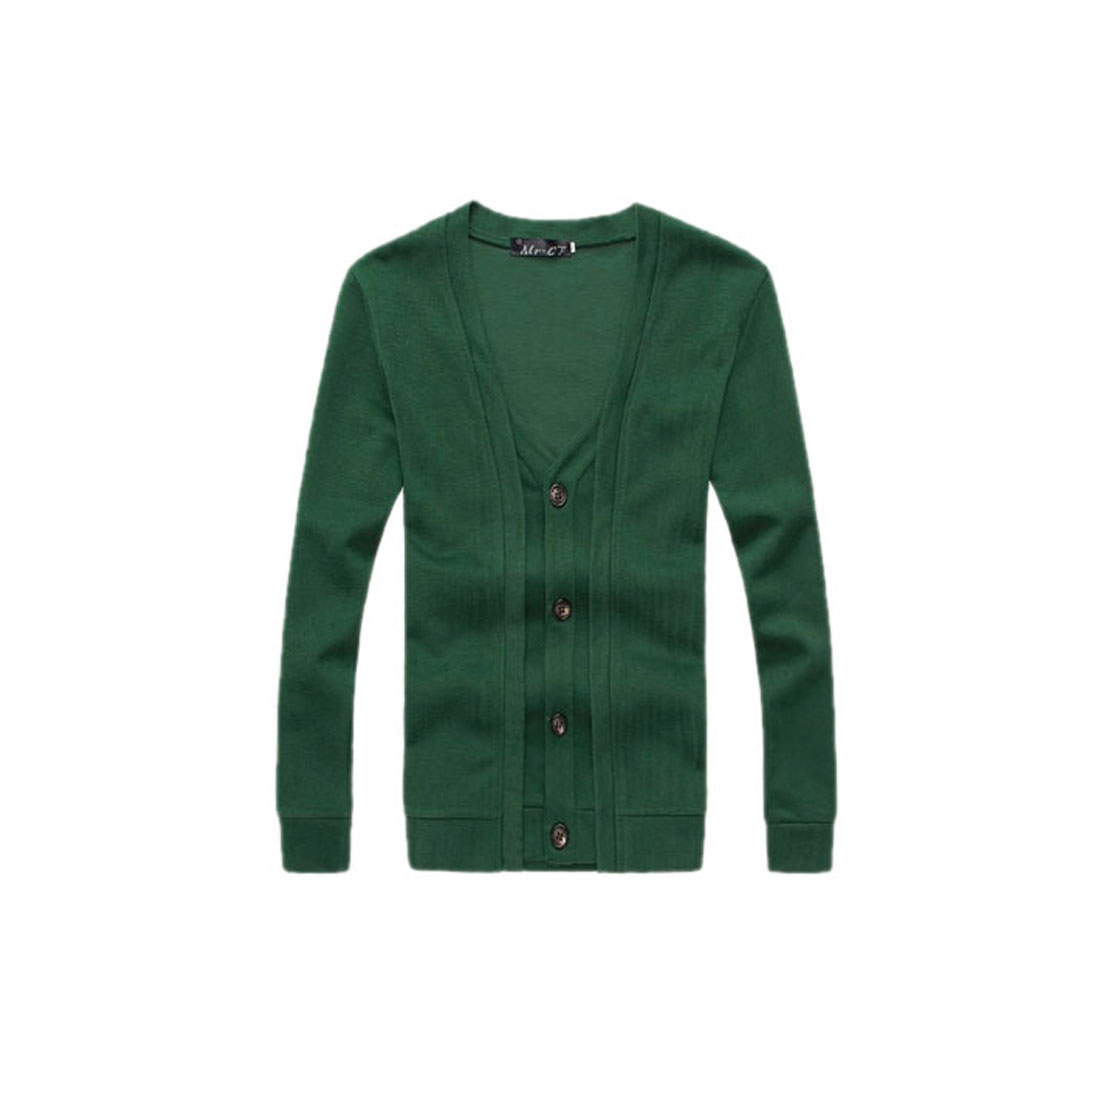 Men NEW Design Long Sleeve V Neck Button Down Layered Green Cardigan M